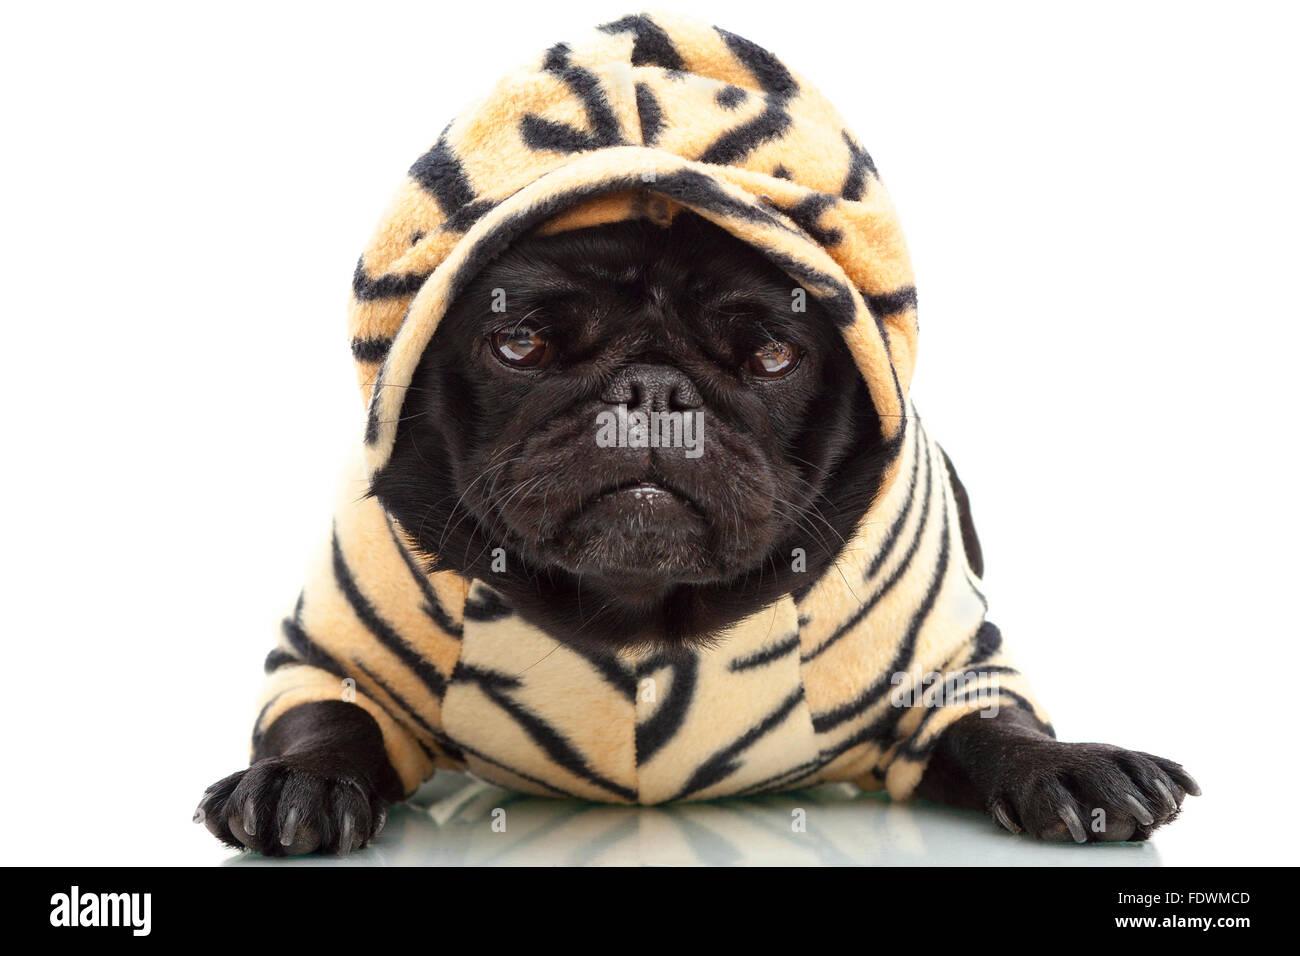 portrait-of-black-pug-puppy-dog-in-tiger